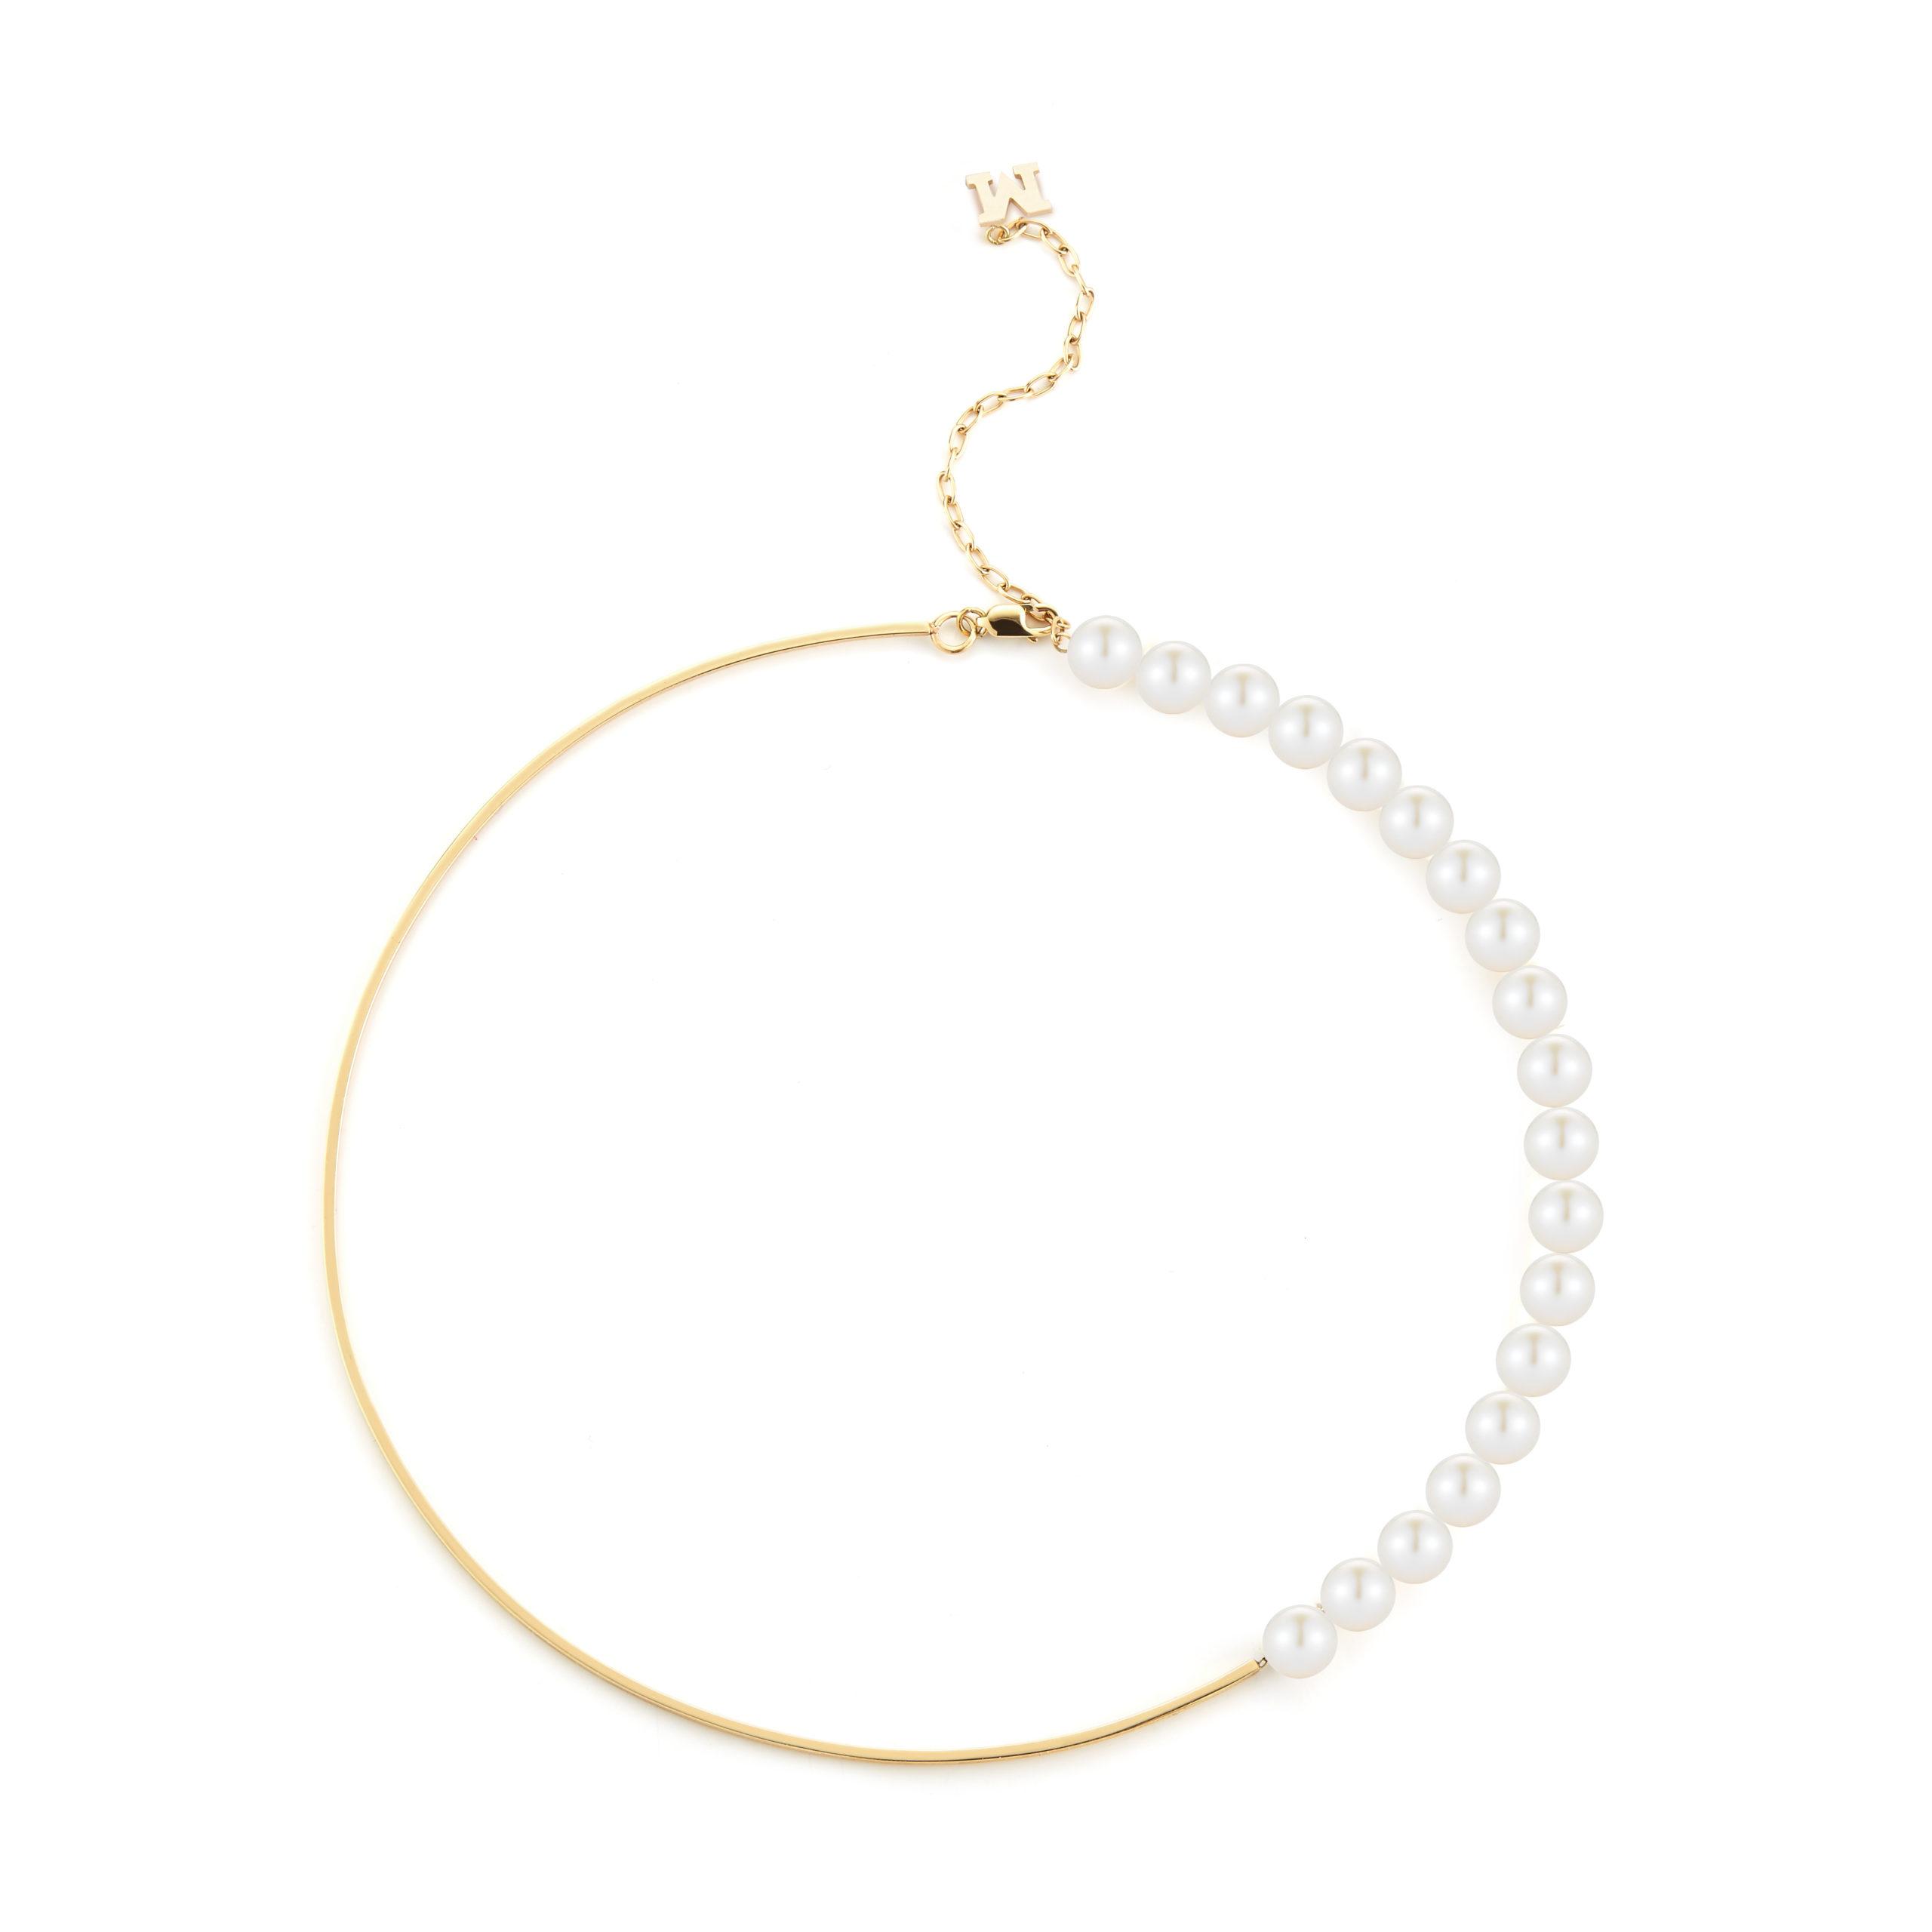 best-june-birthstone-jewellery-for-june-birthdays-21-mateo